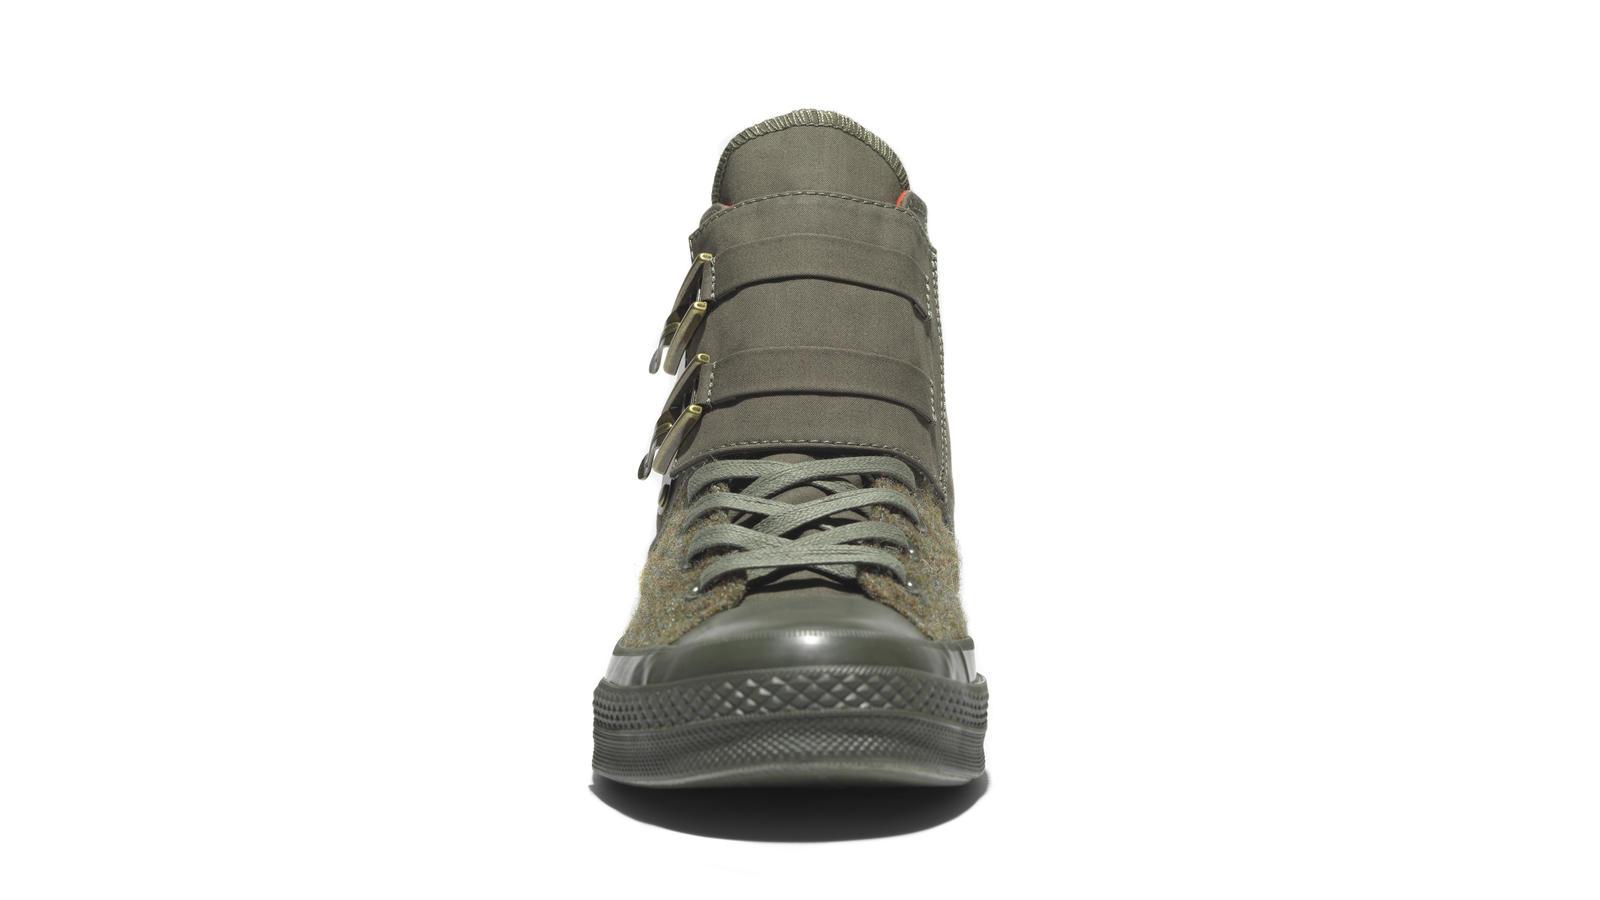 Fh16 Fs Ctas70 Nigel Cabourn Green Toe Single 153333 C